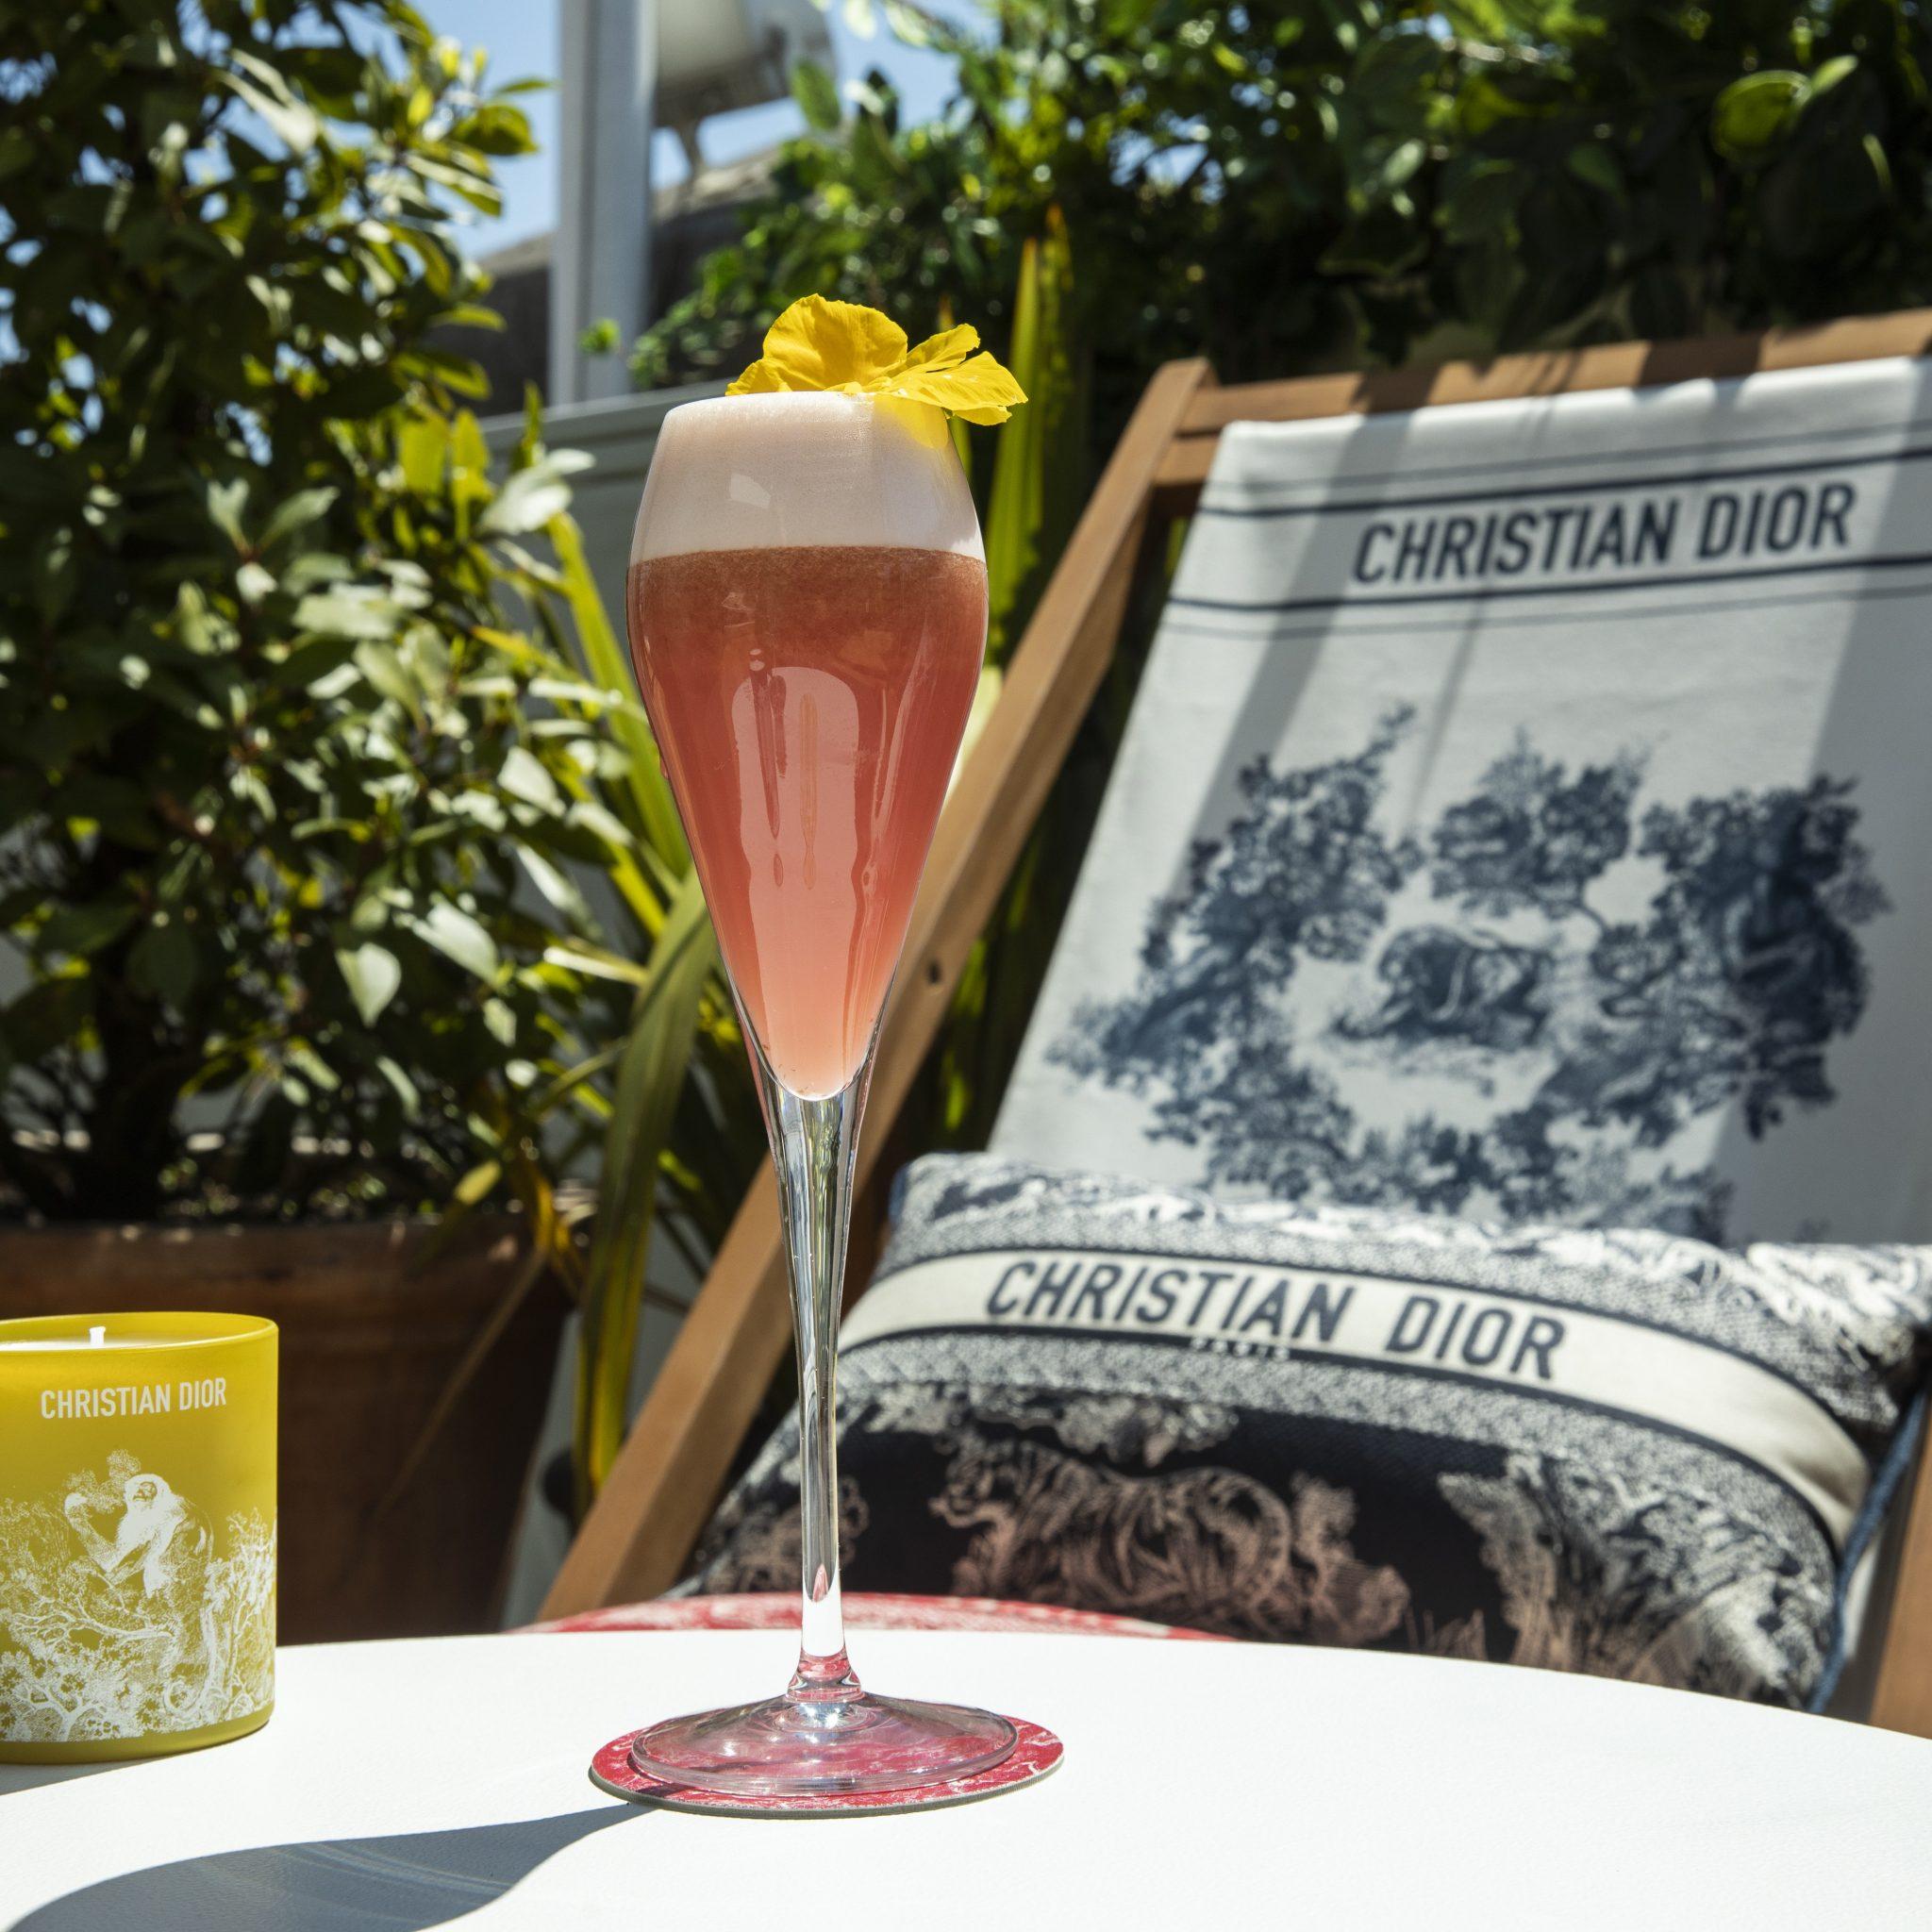 Cocktails and Dior cushions at Dior at Alto restaurant Selfridges